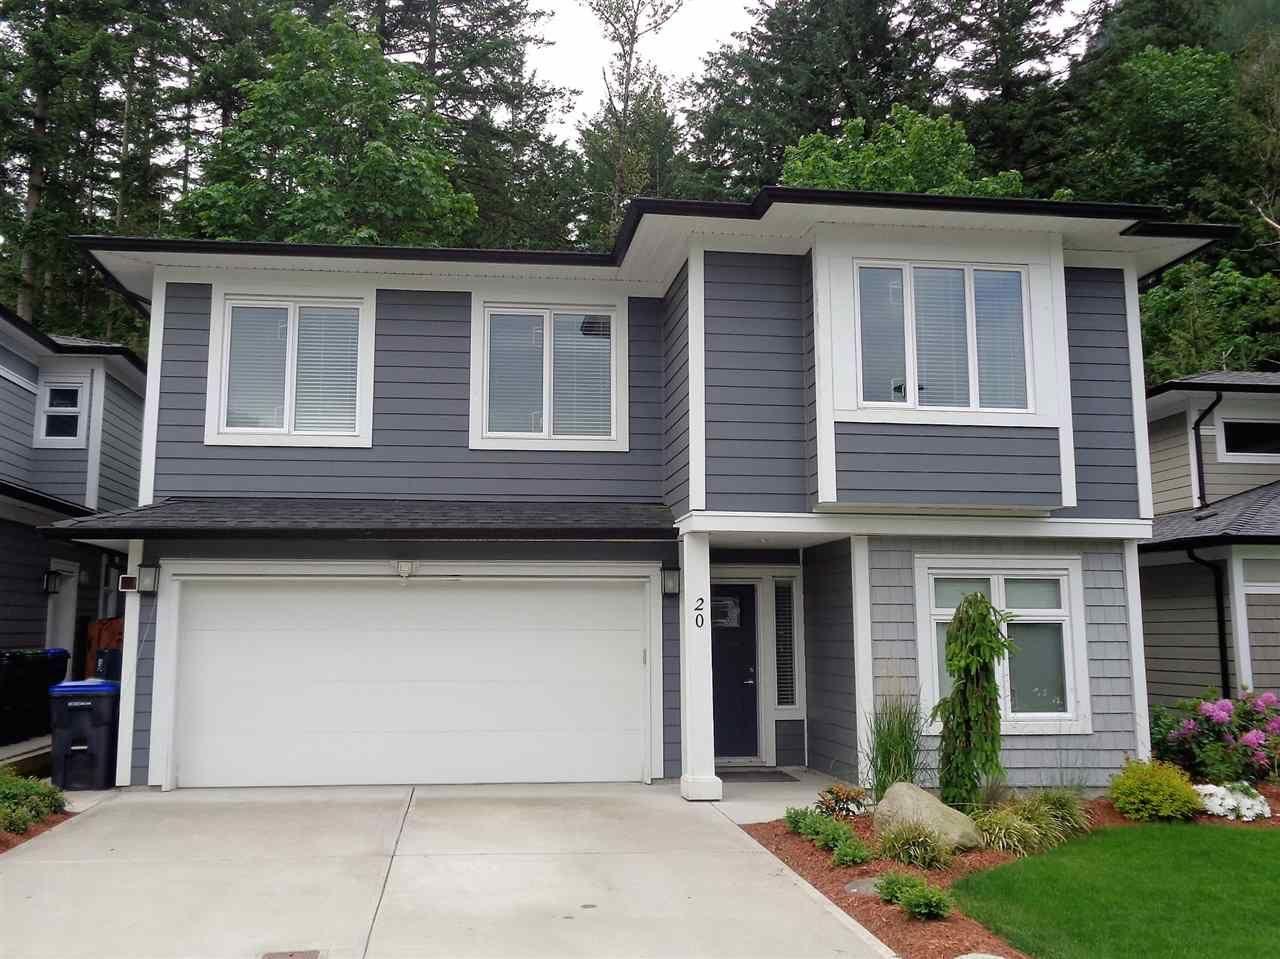 Main Photo: 20 63650 FLOOD HOPE Road in Hope: Hope Silver Creek House for sale : MLS®# R2462162